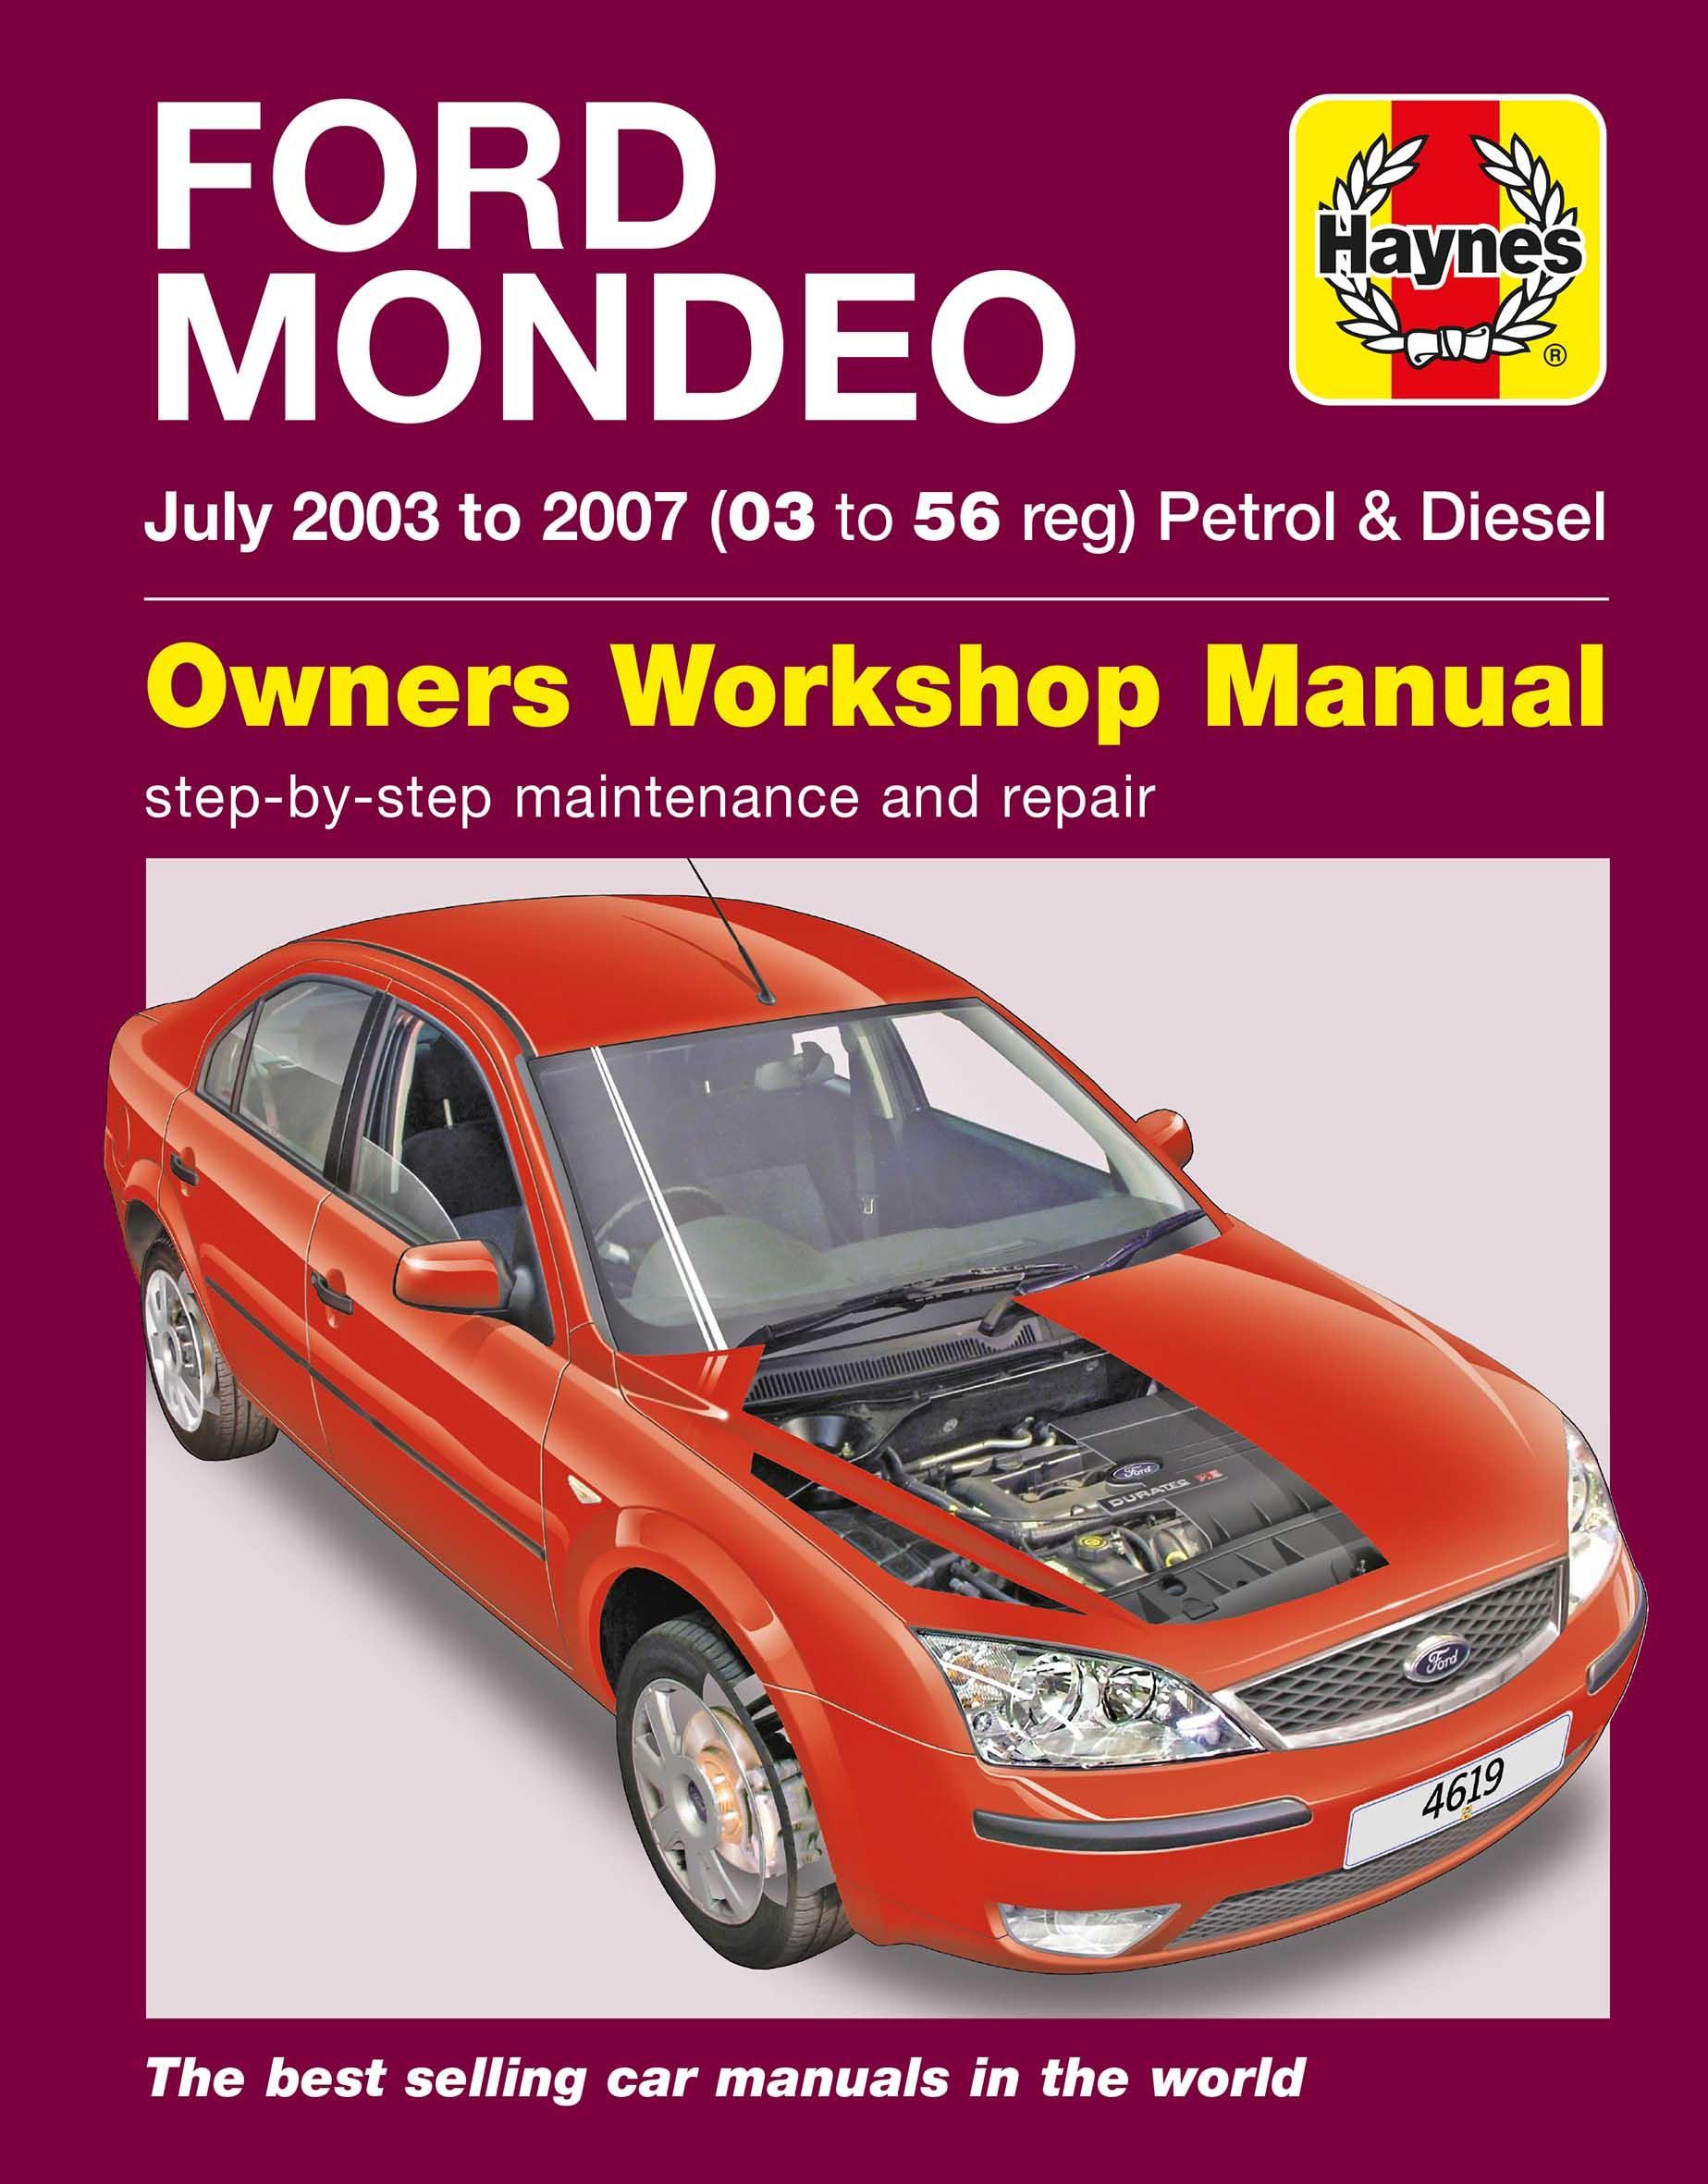 ford mondeo mark 3 owners manual open source user manual u2022 rh dramatic varieties com 2007 ford fiesta owners manual 2016 Ford Mondeo